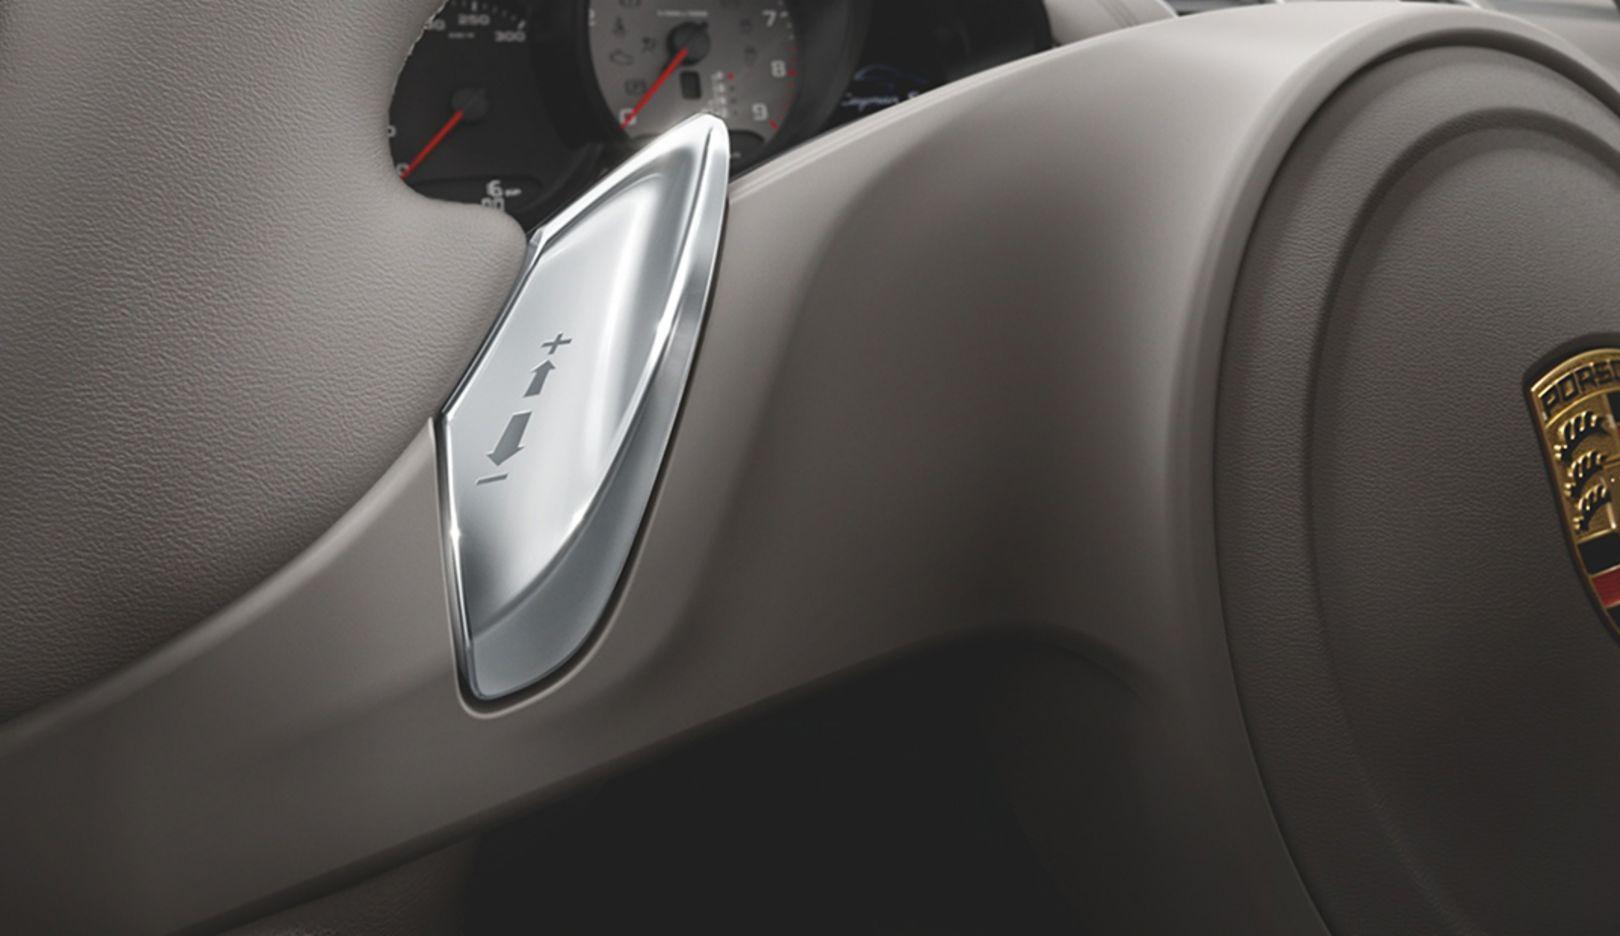 Cayman S, Detailaufnahme, 2014, Porsche AG